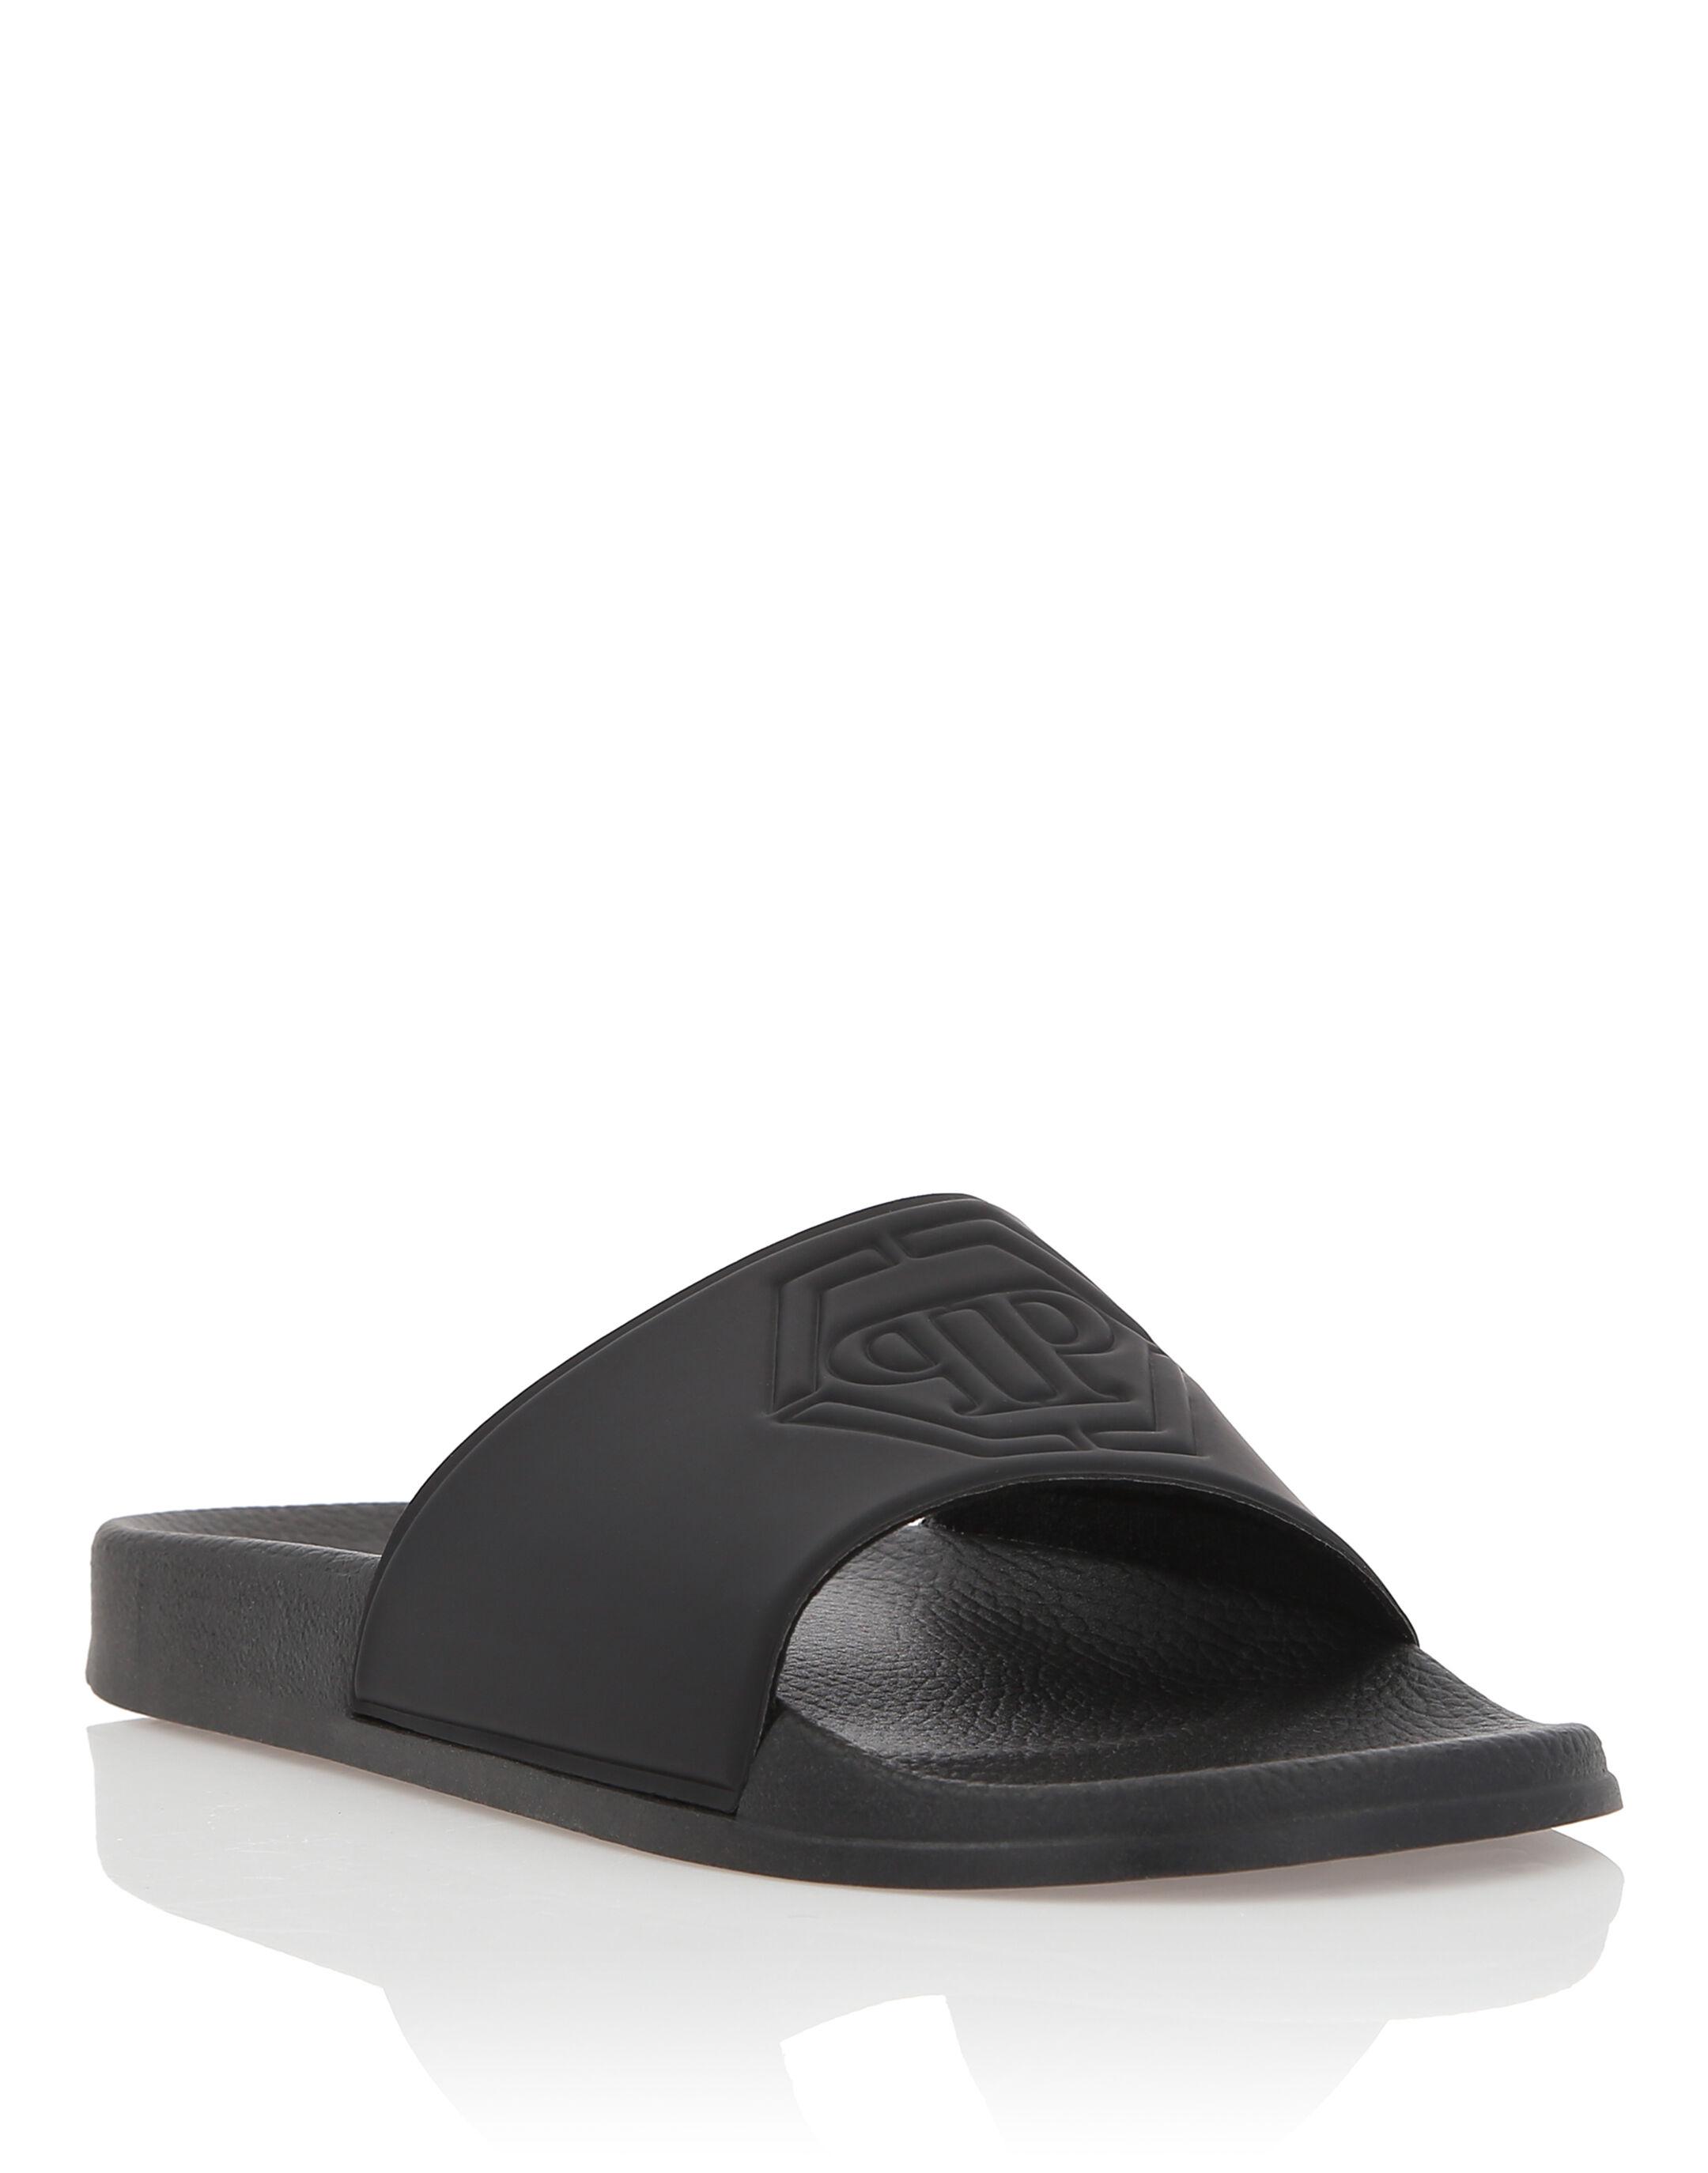 Philipp Sentir Les Chaussures De Plein Vent 28xEE